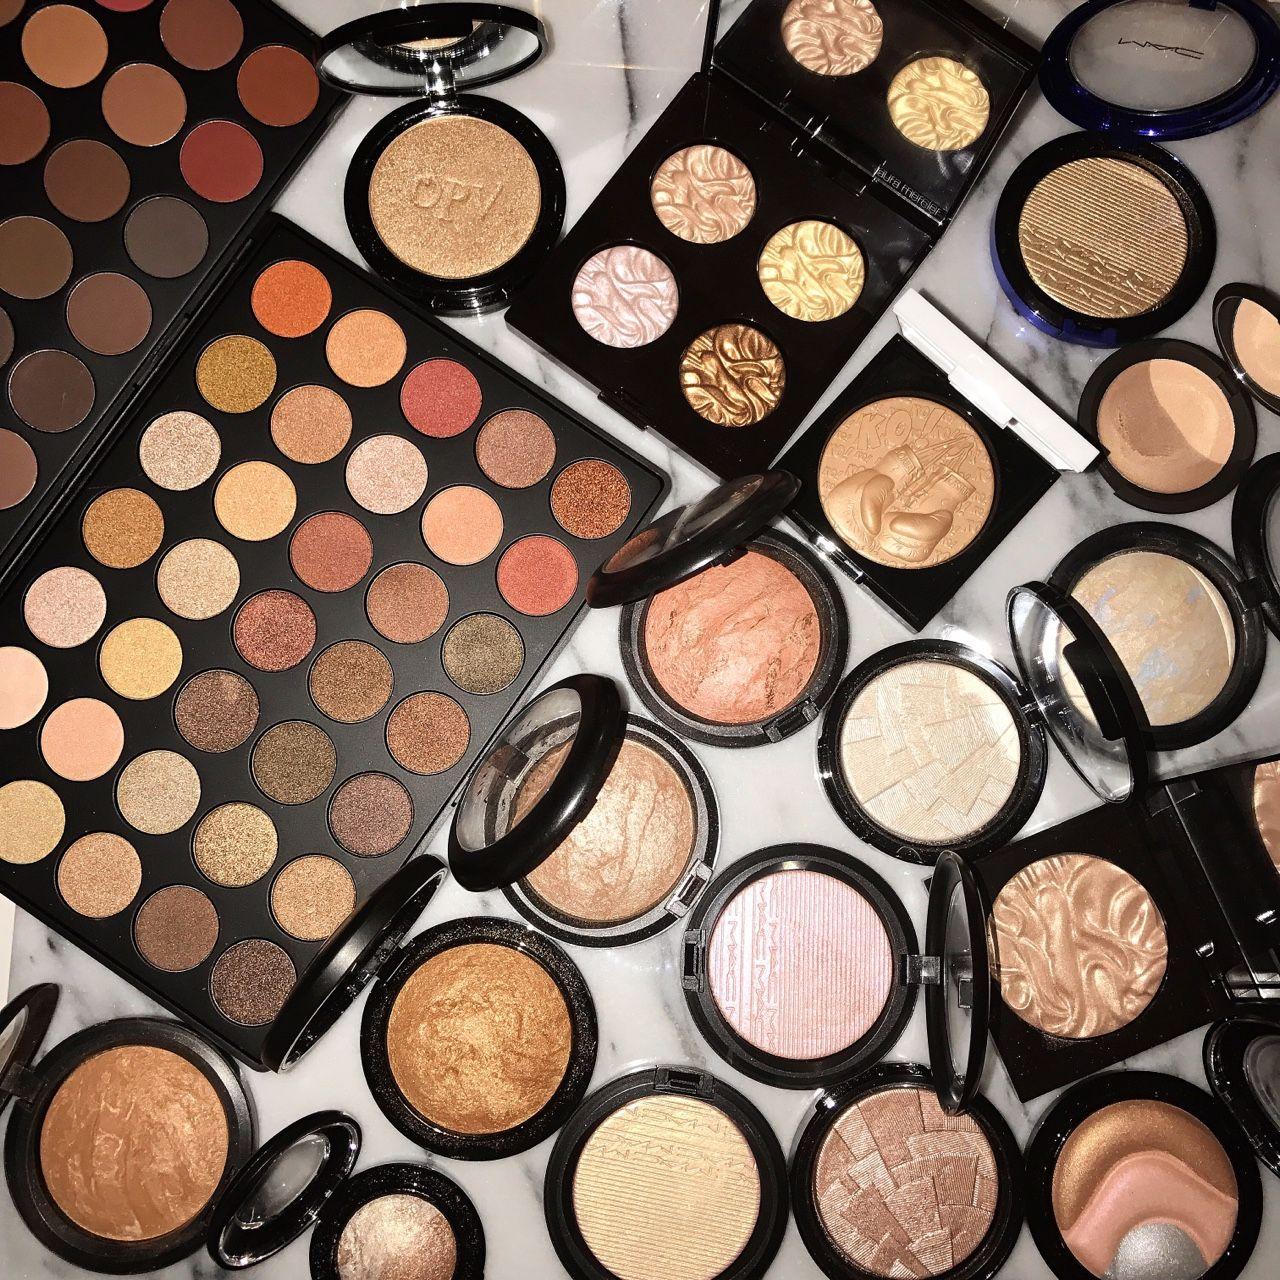 slave2beauty on instagram Makeup geek, Makeup brush set